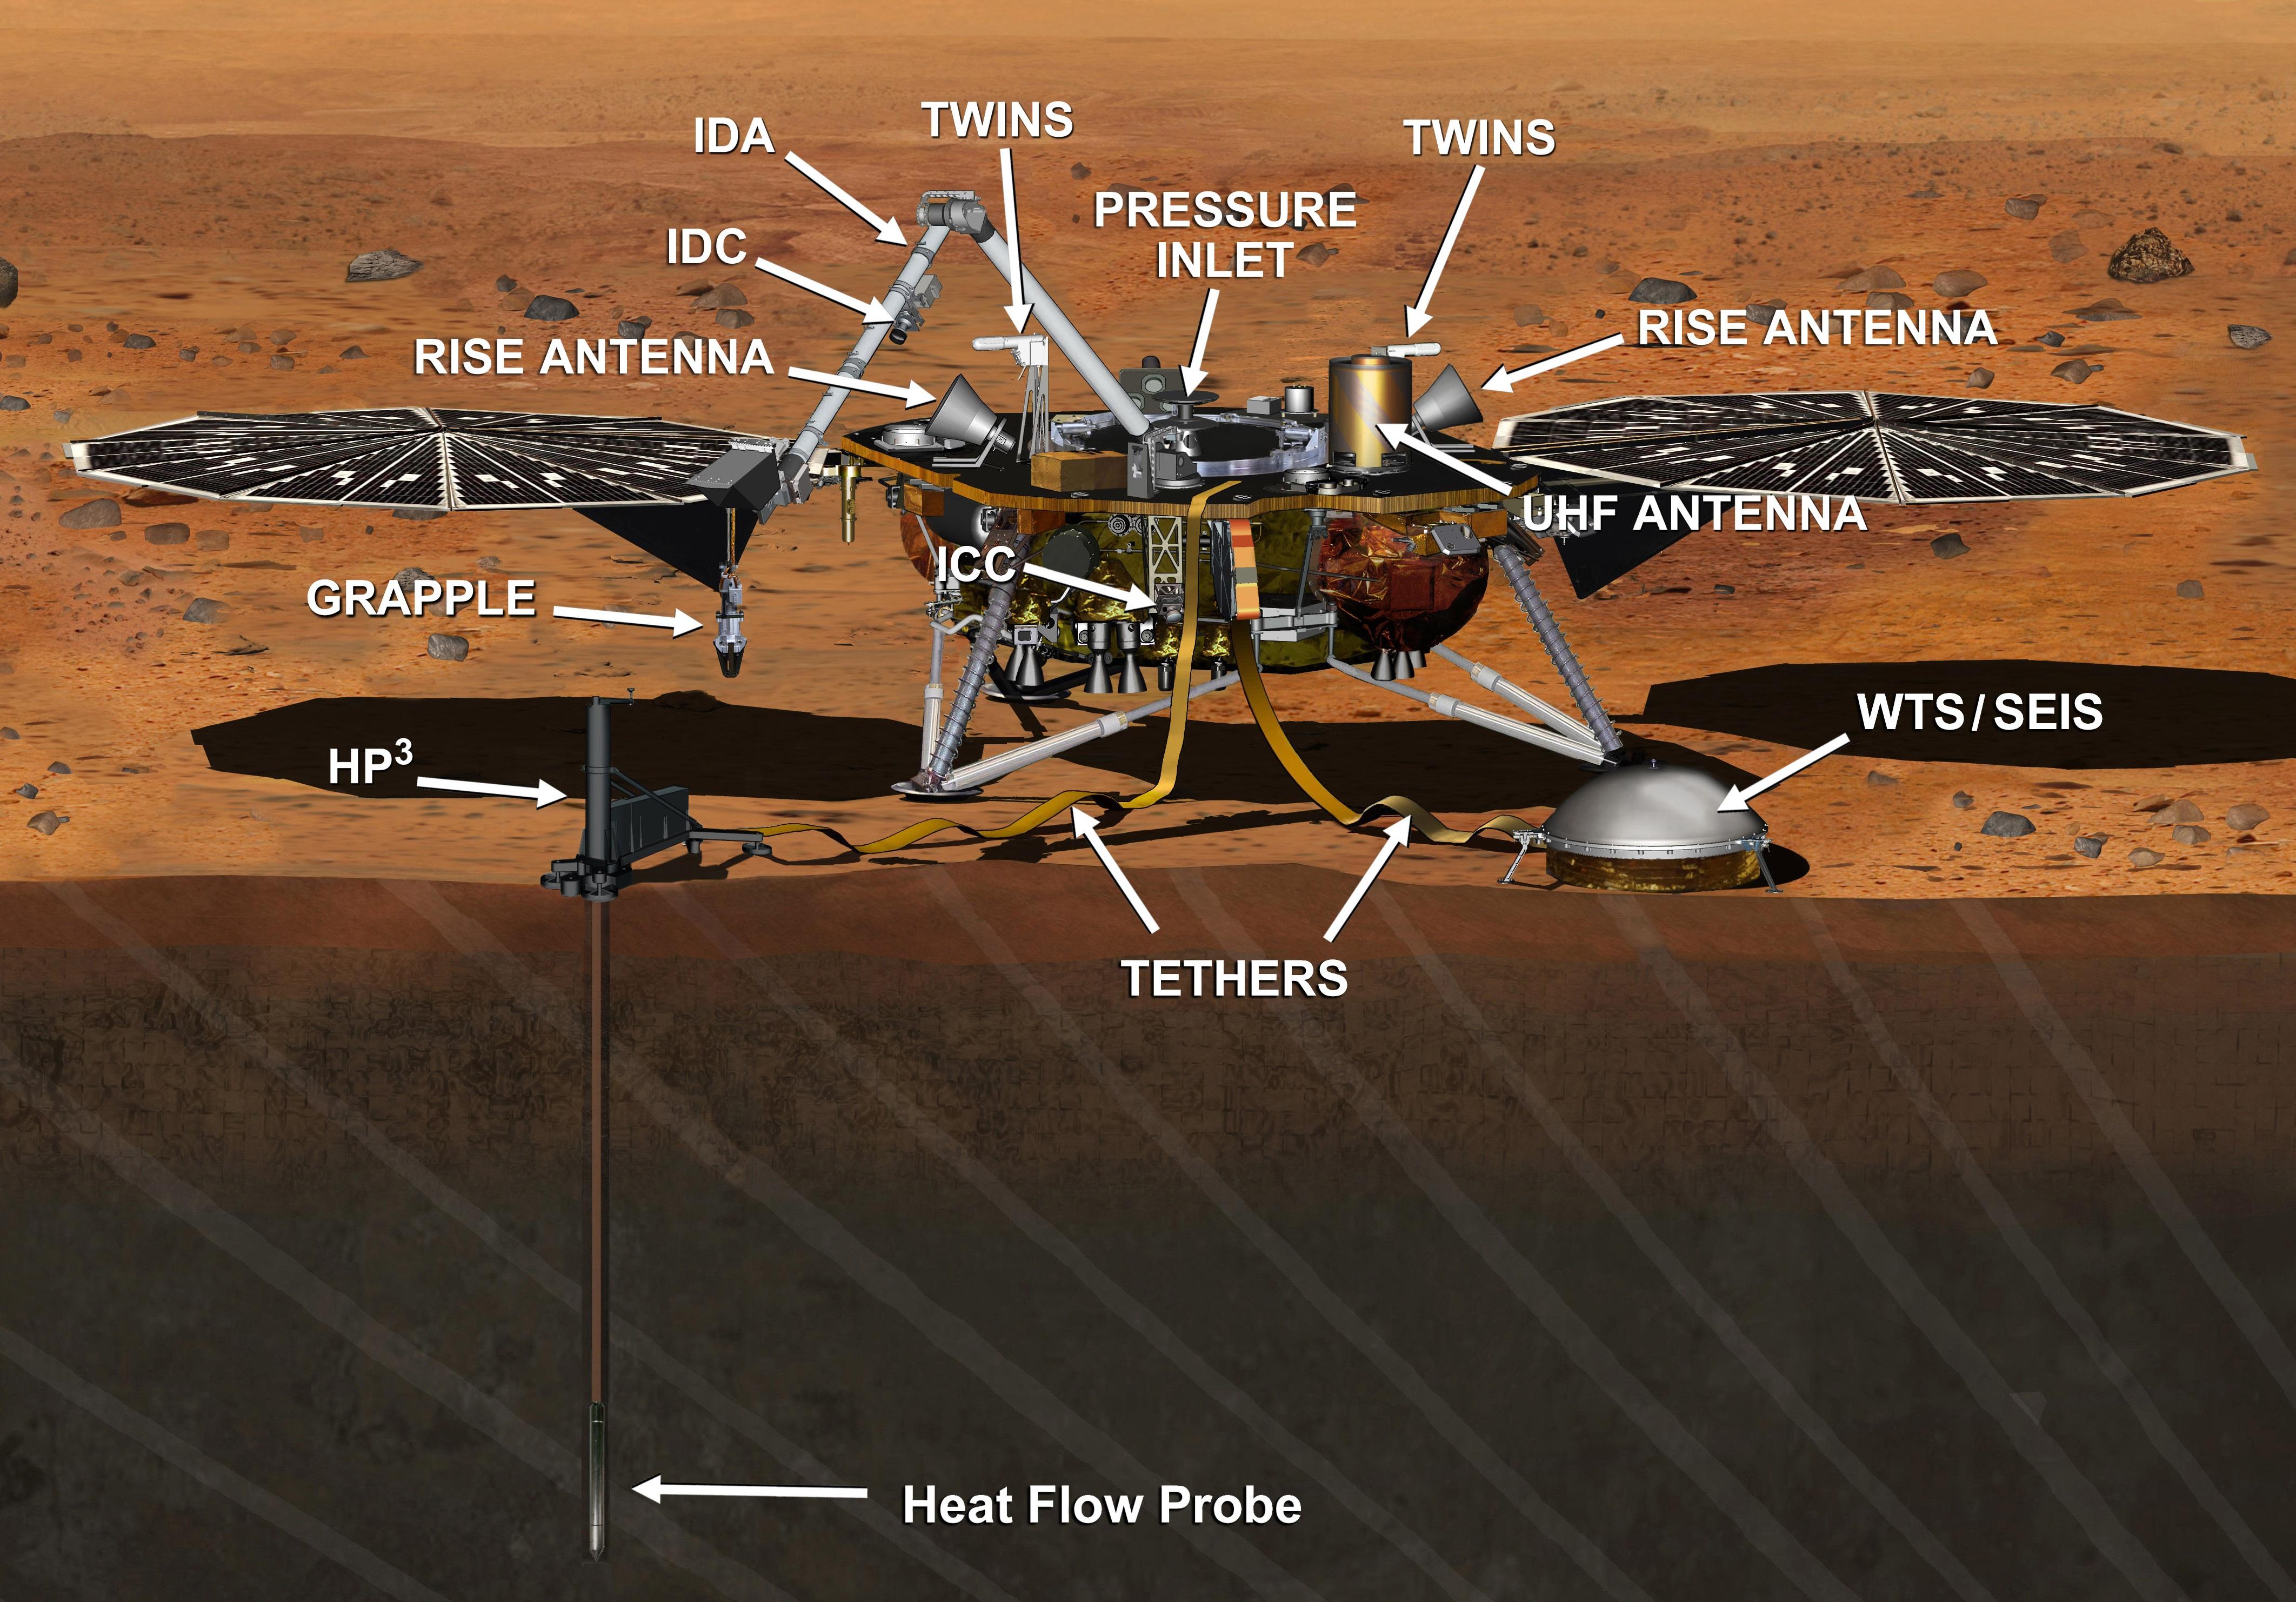 mars rover insight update - photo #14